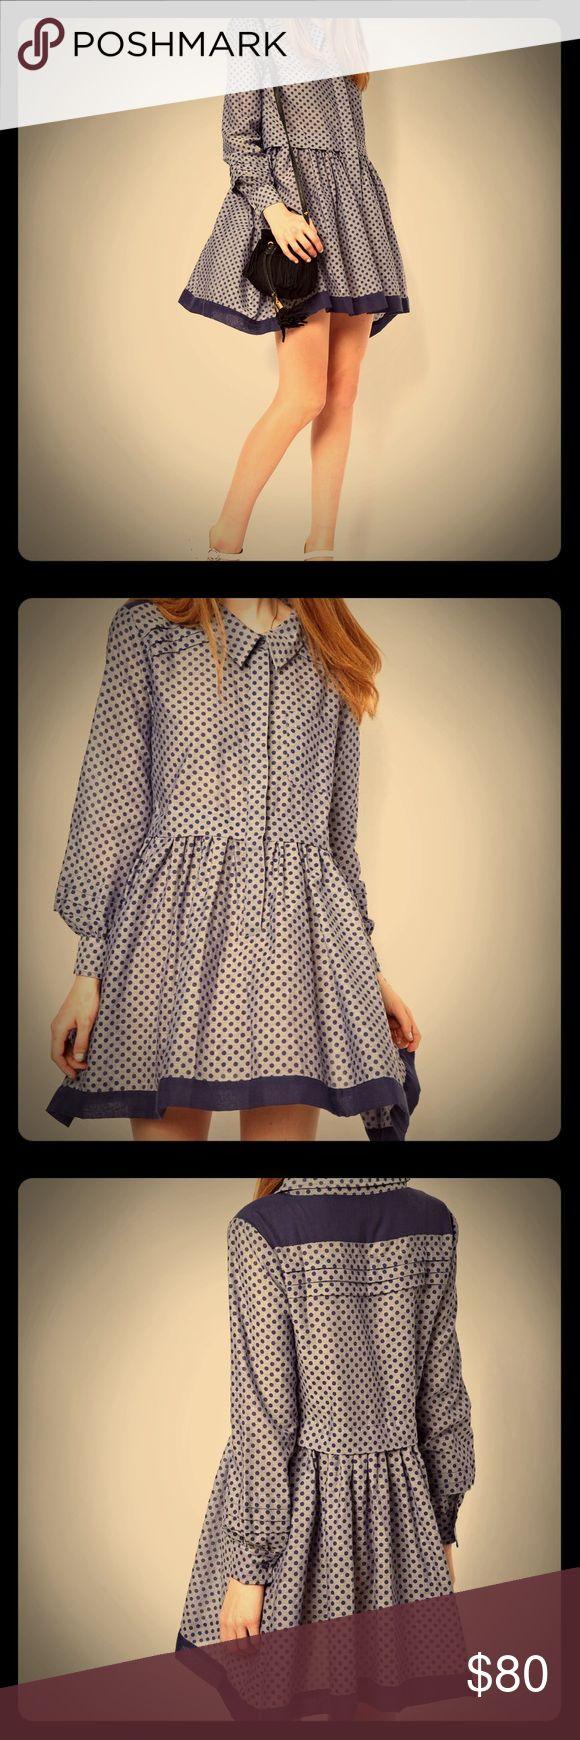 Asos shirt dress in chambray spot Lovely lightweight flowy oversized shirt dress, light blue with dark blue polka dots. ASOS Dresses Mini